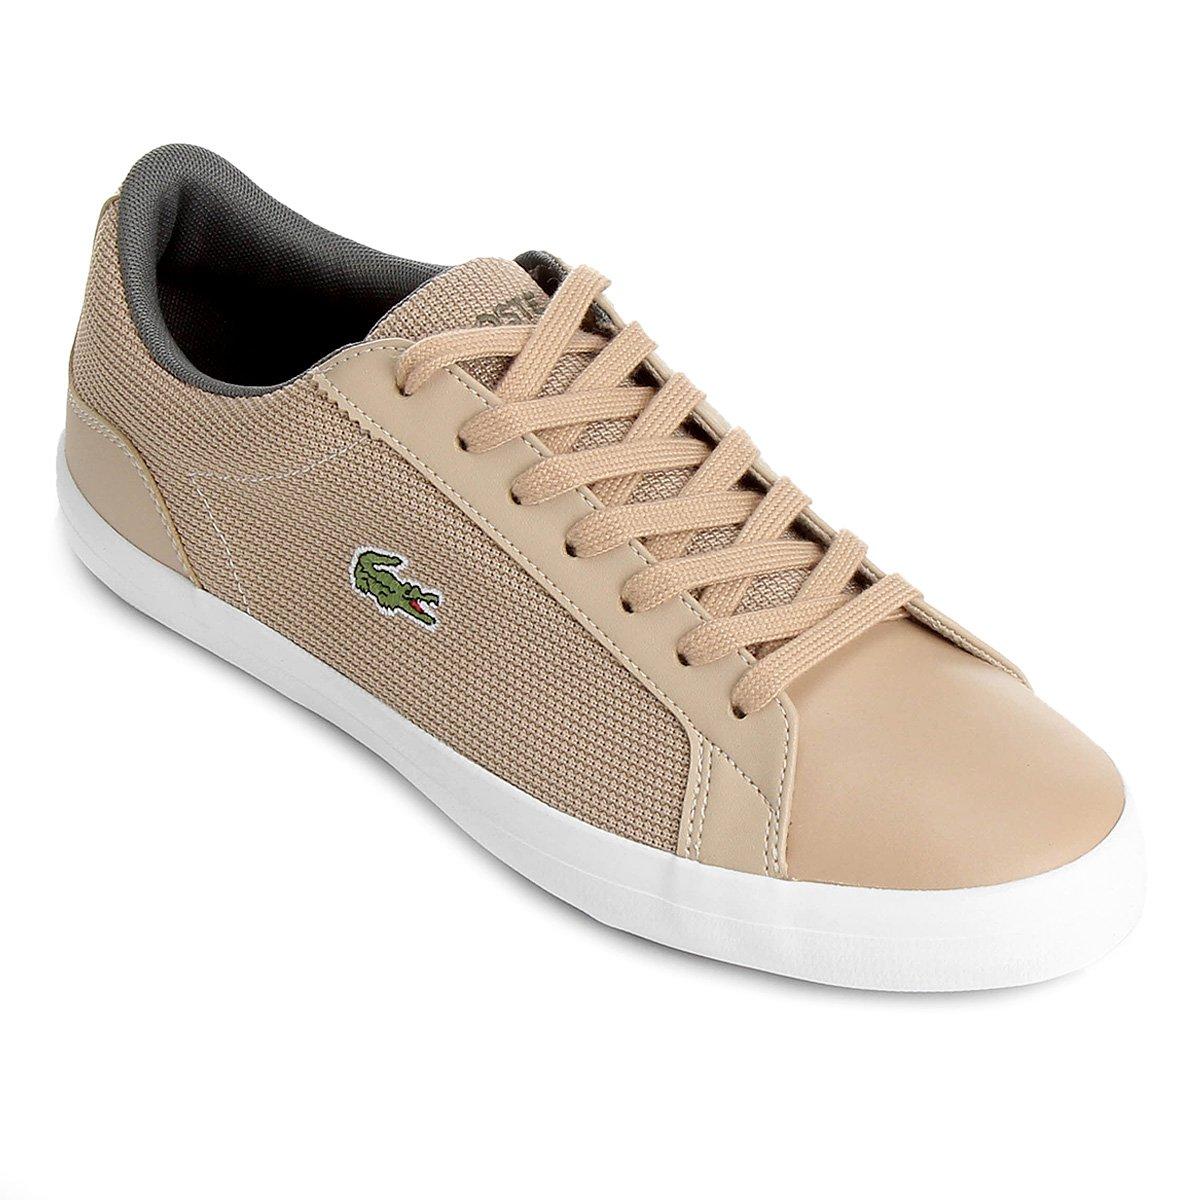 Tênis Lacoste Q1 Lerond Masculino - Compre Agora   Netshoes 44132d33a1